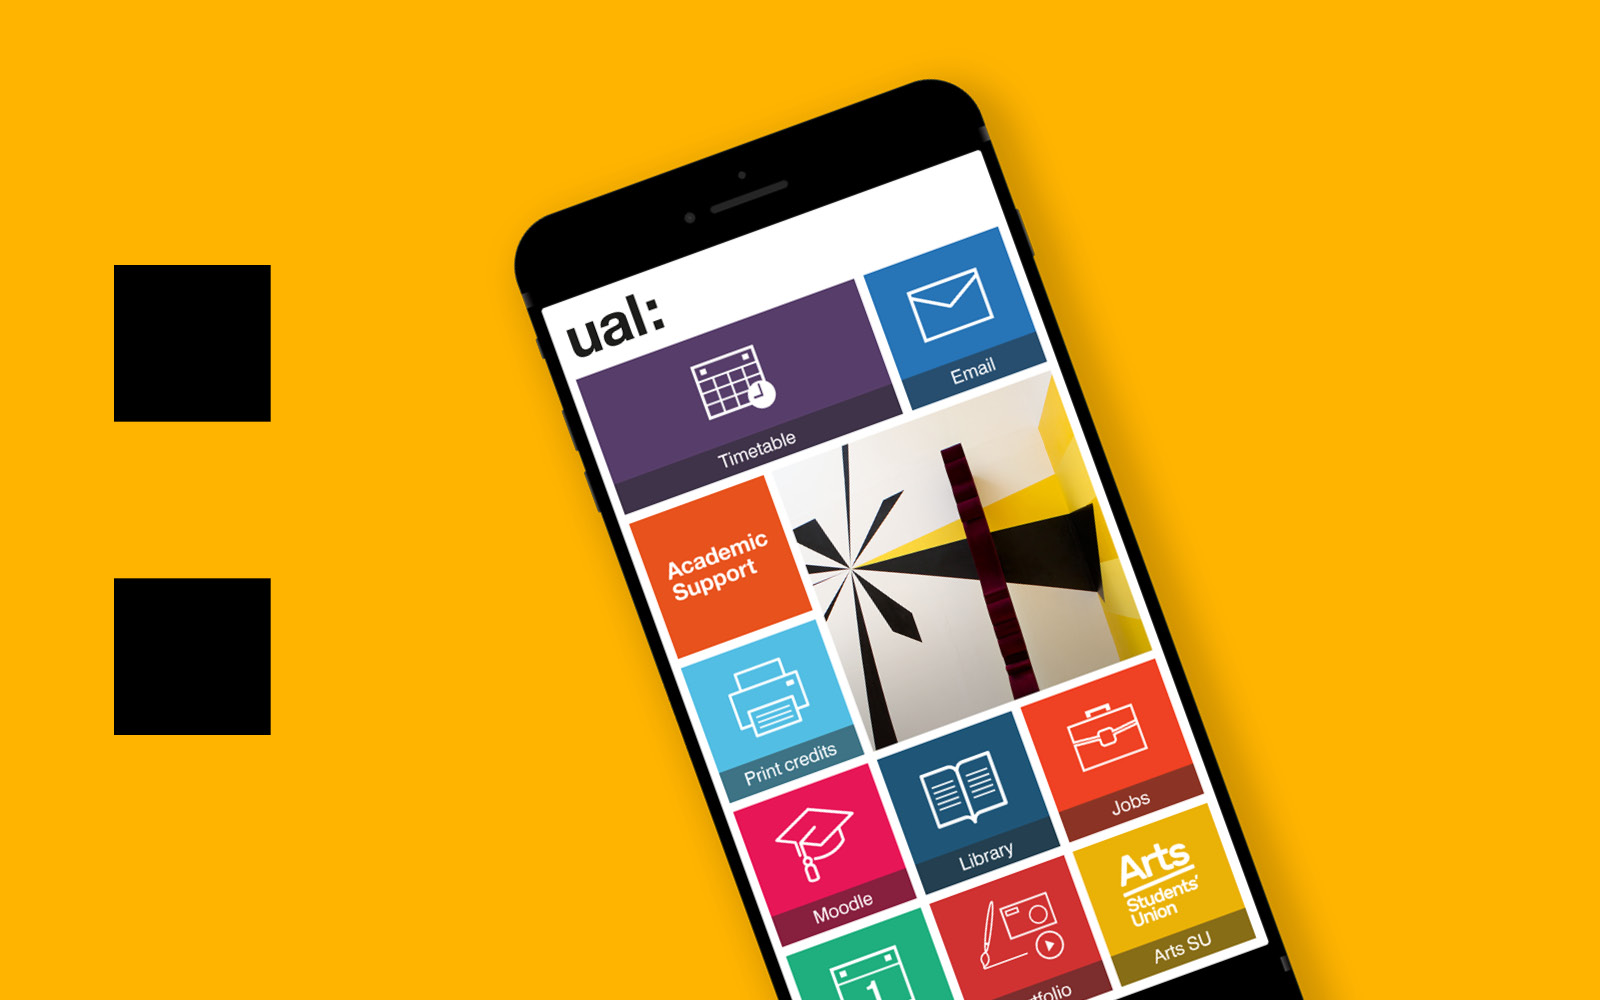 MyUAL app